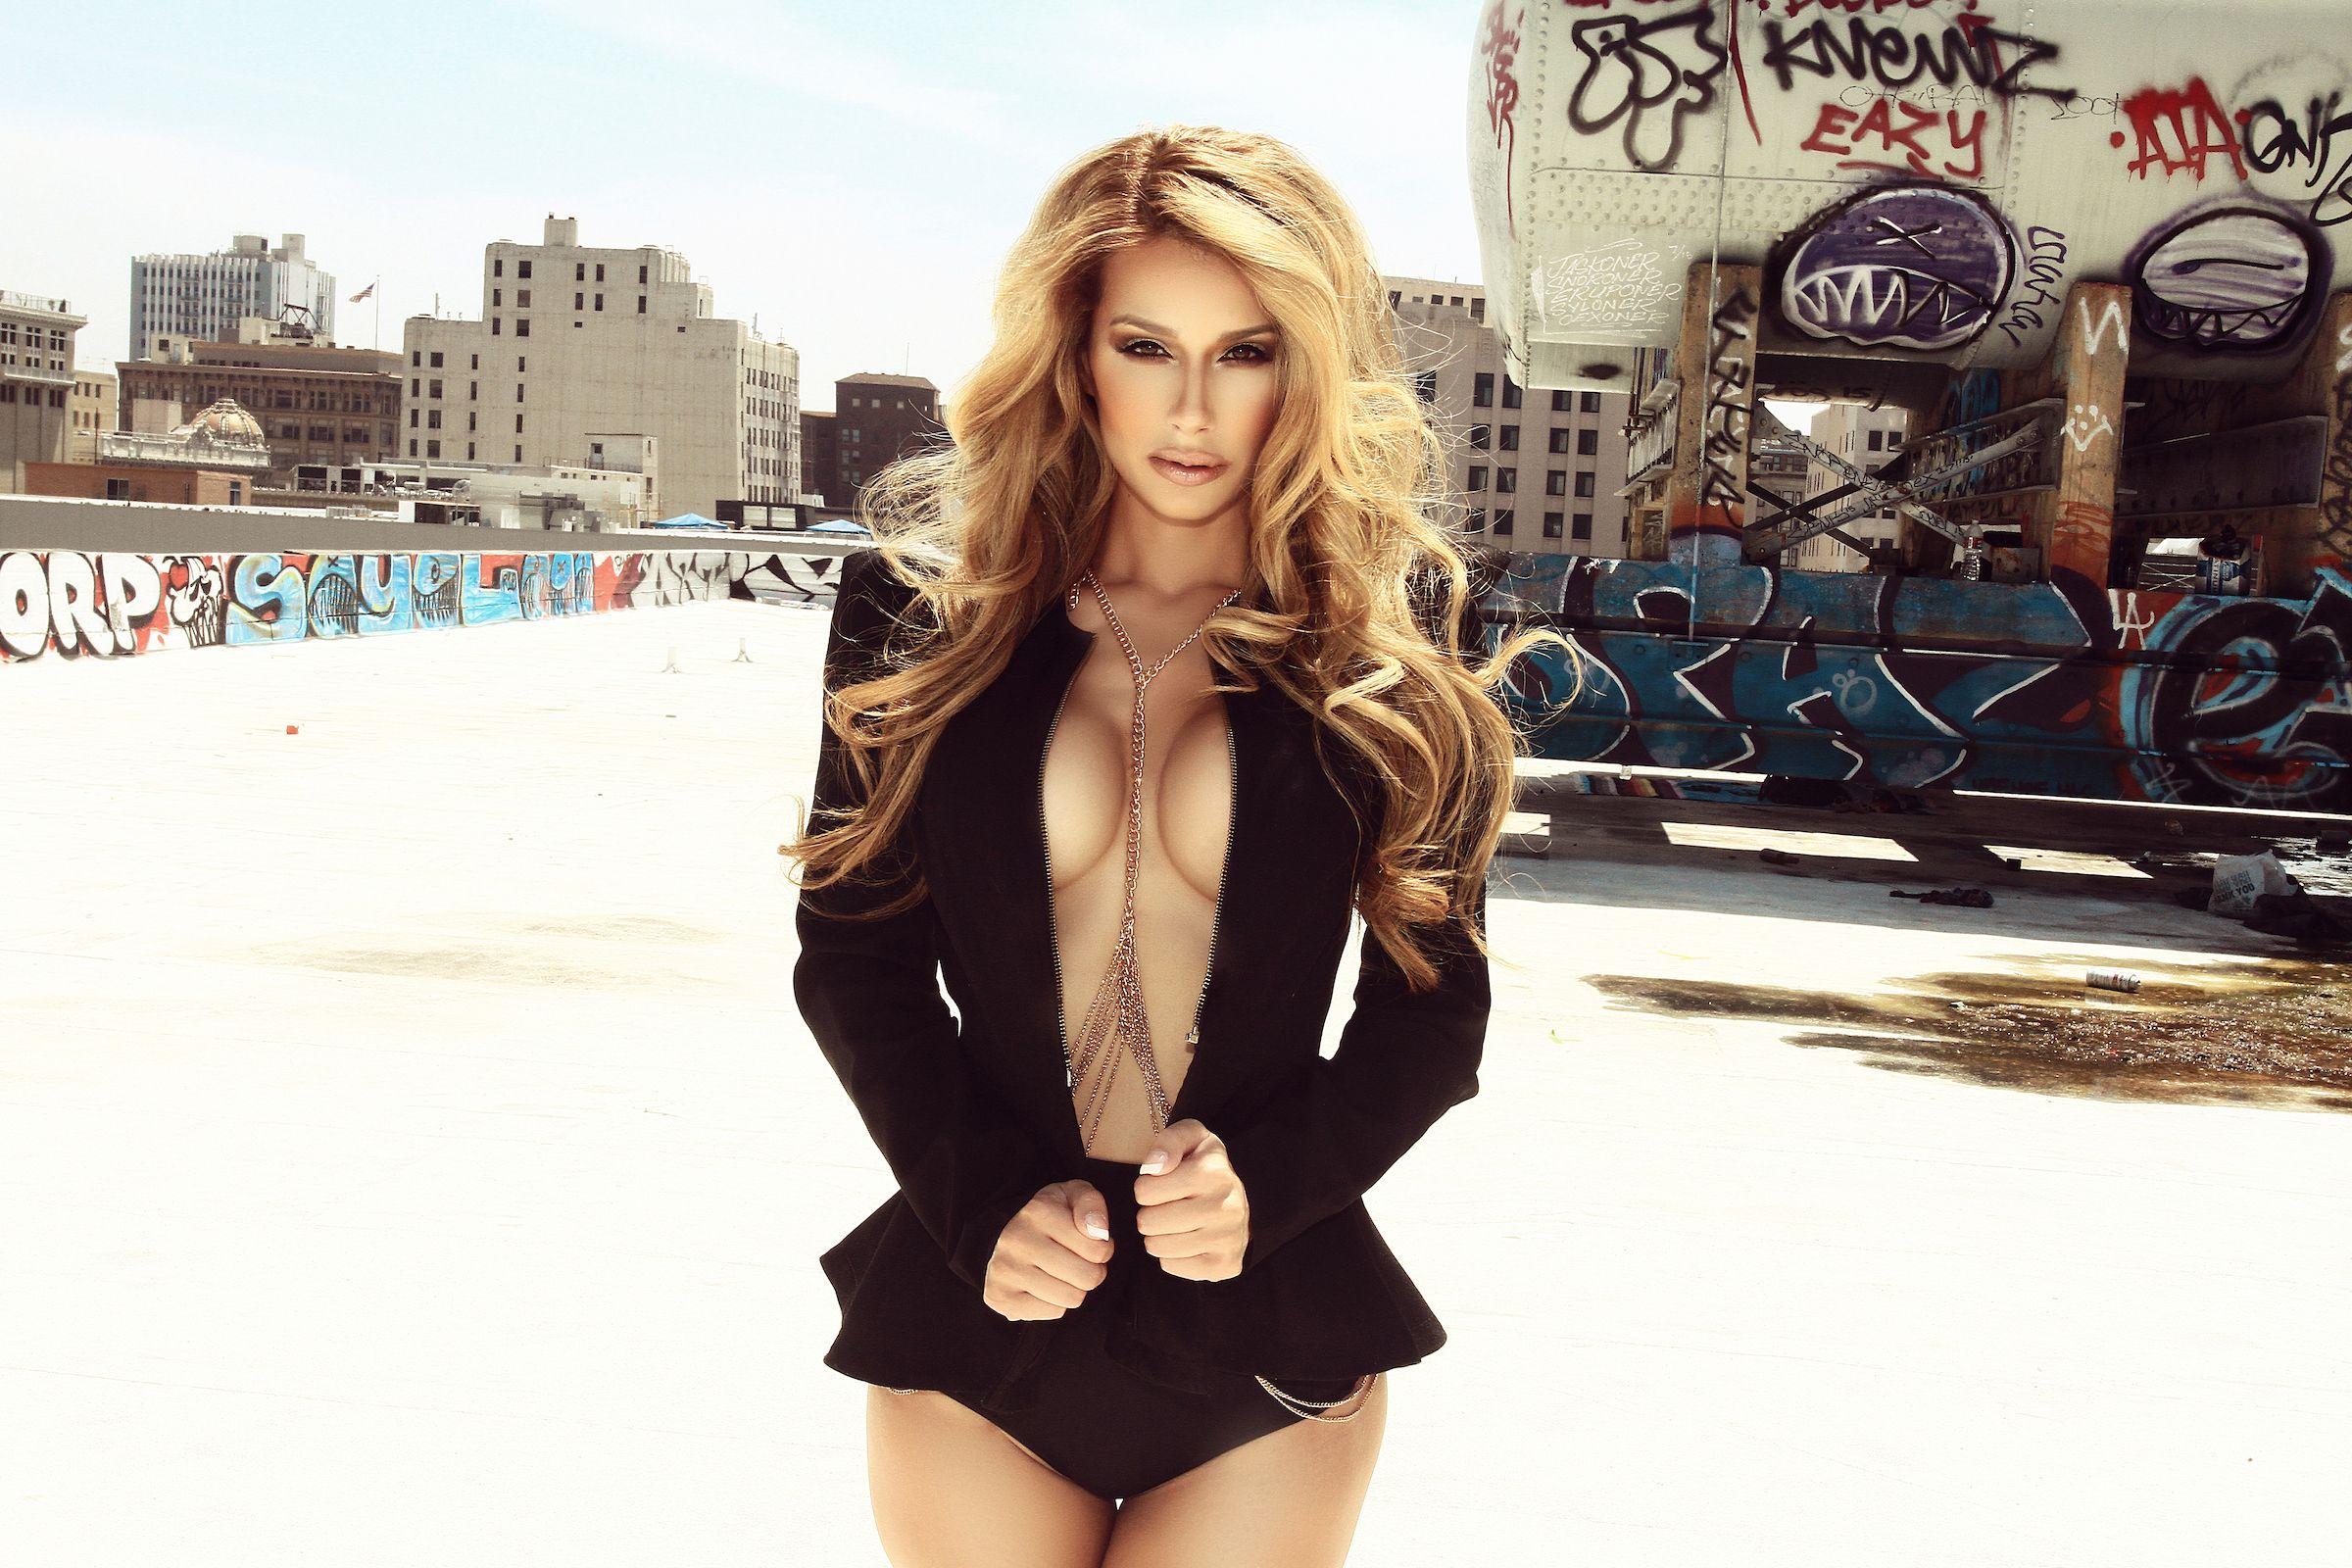 Images Amanda Riley nude (85 photos), Ass, Hot, Selfie, butt 2018